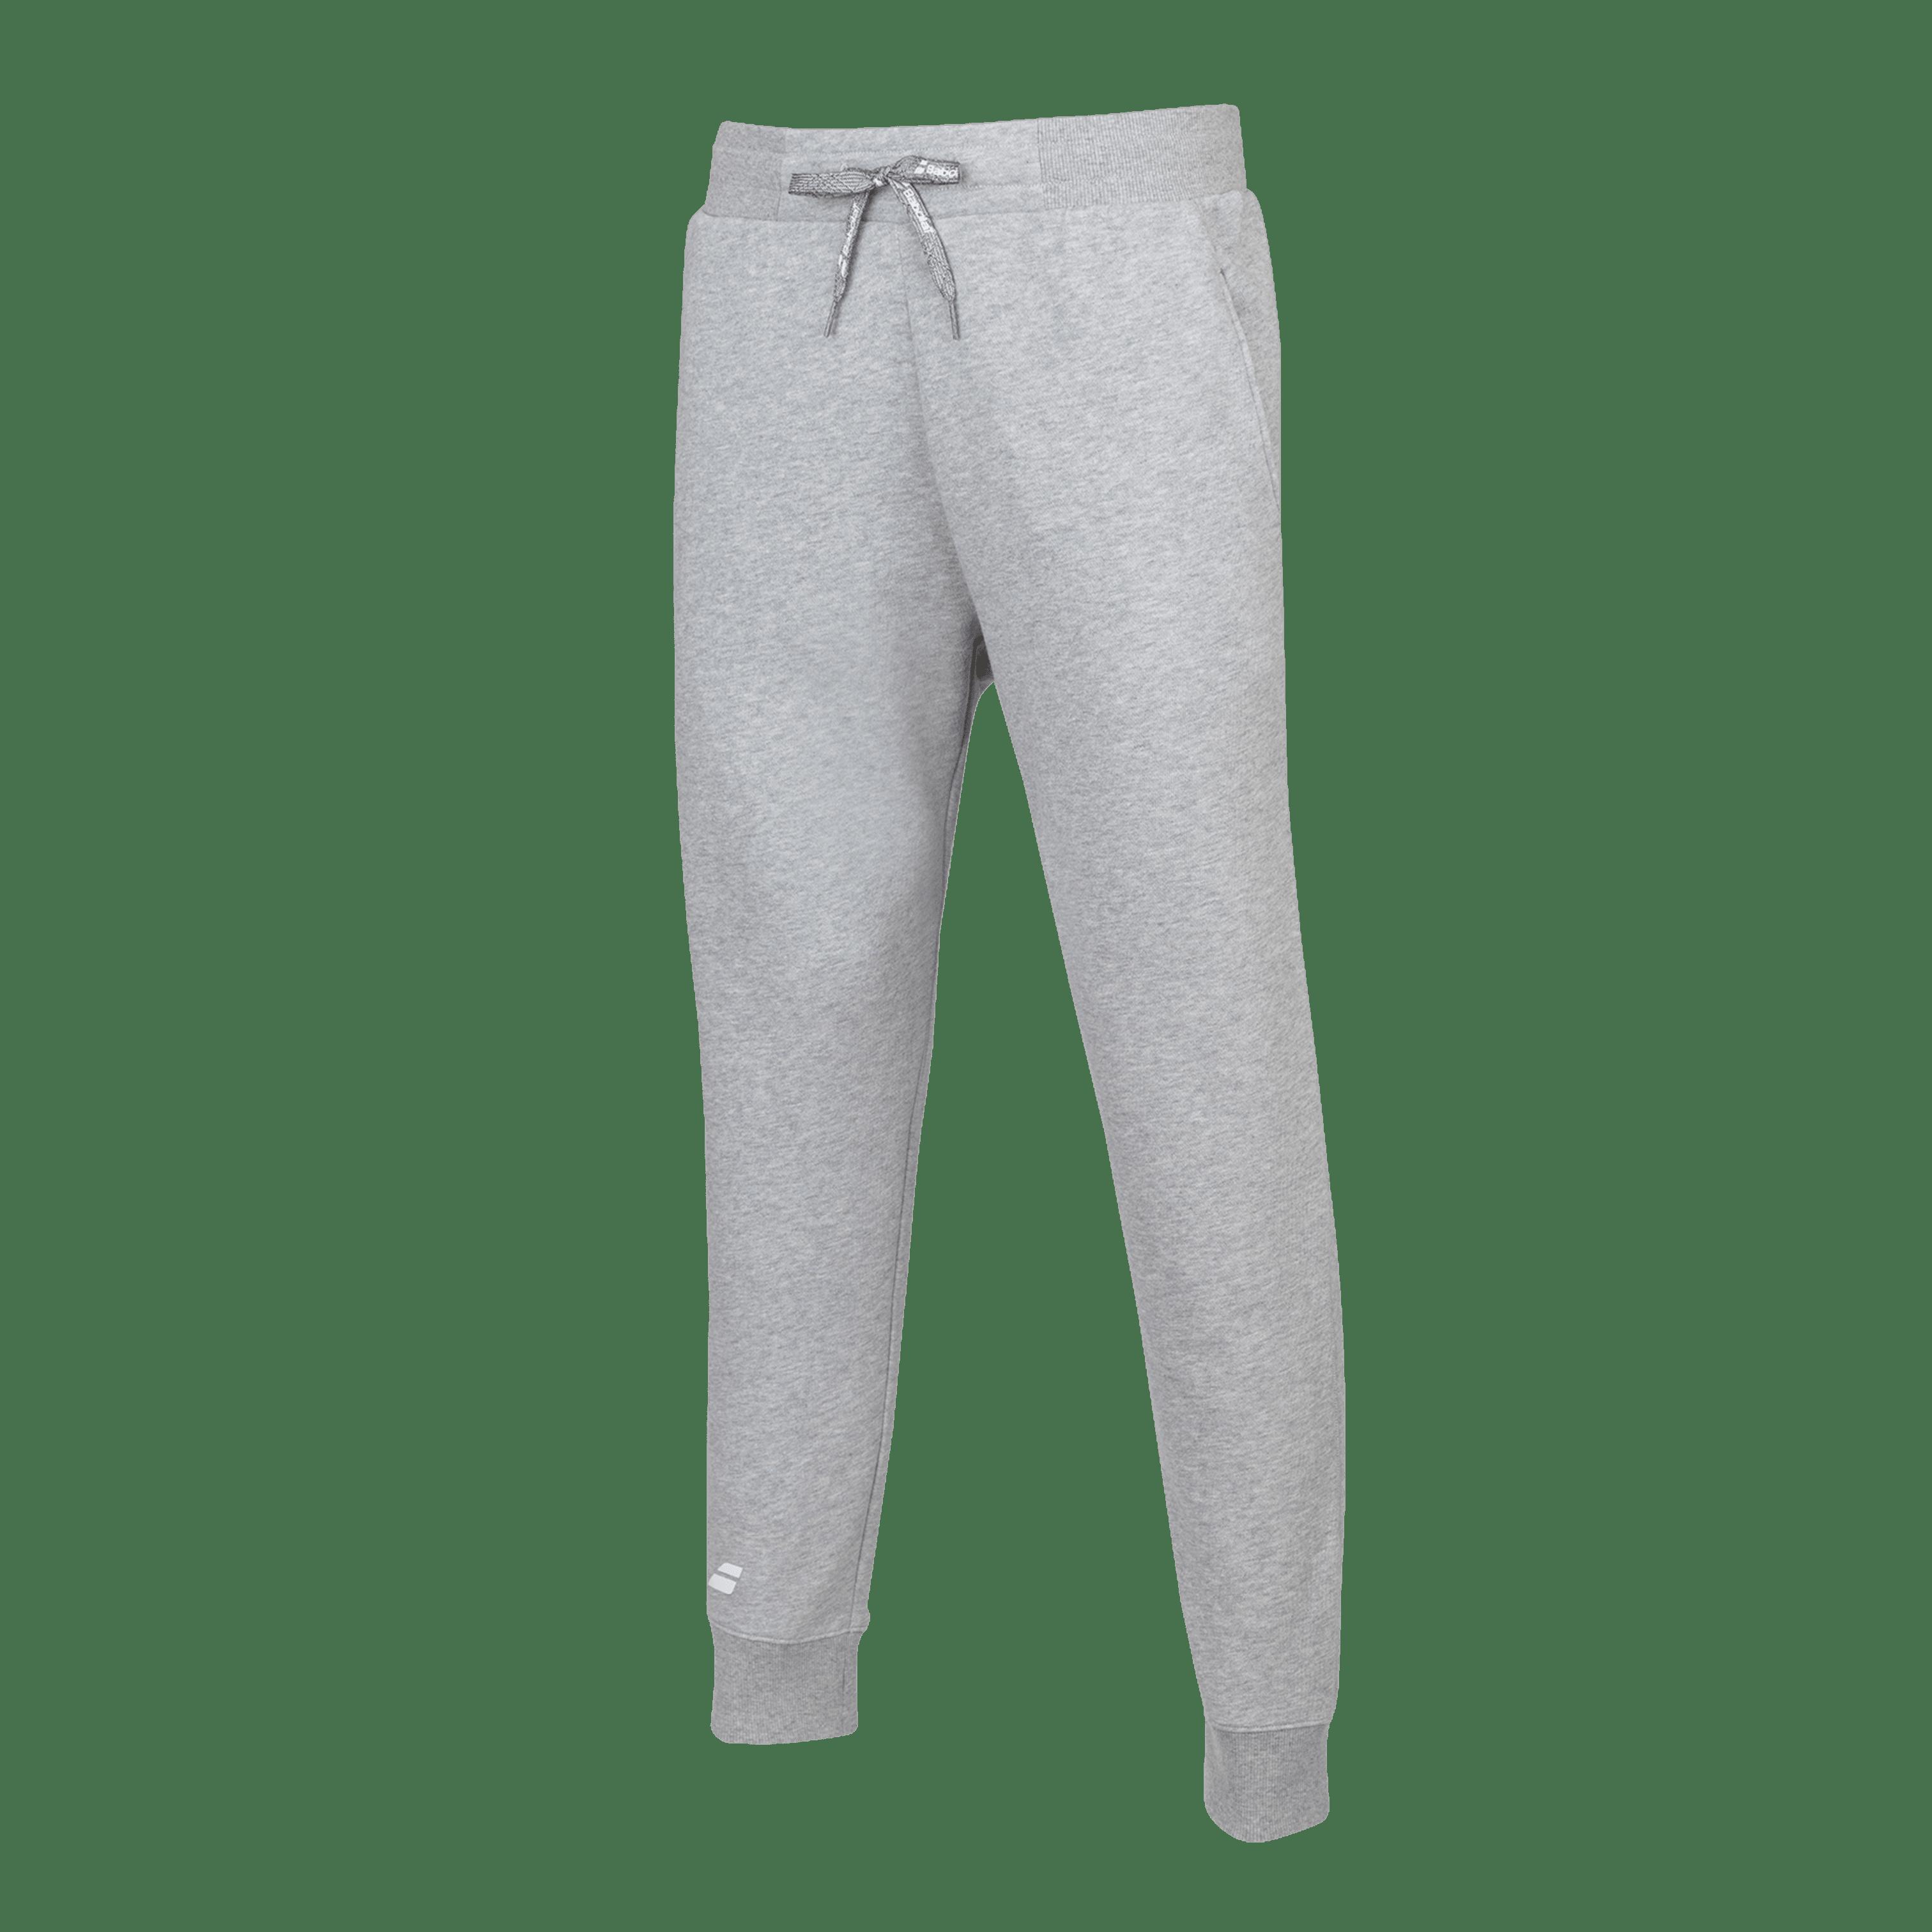 Babolat Childrens Exercise Jogger Pant Jr Trouser